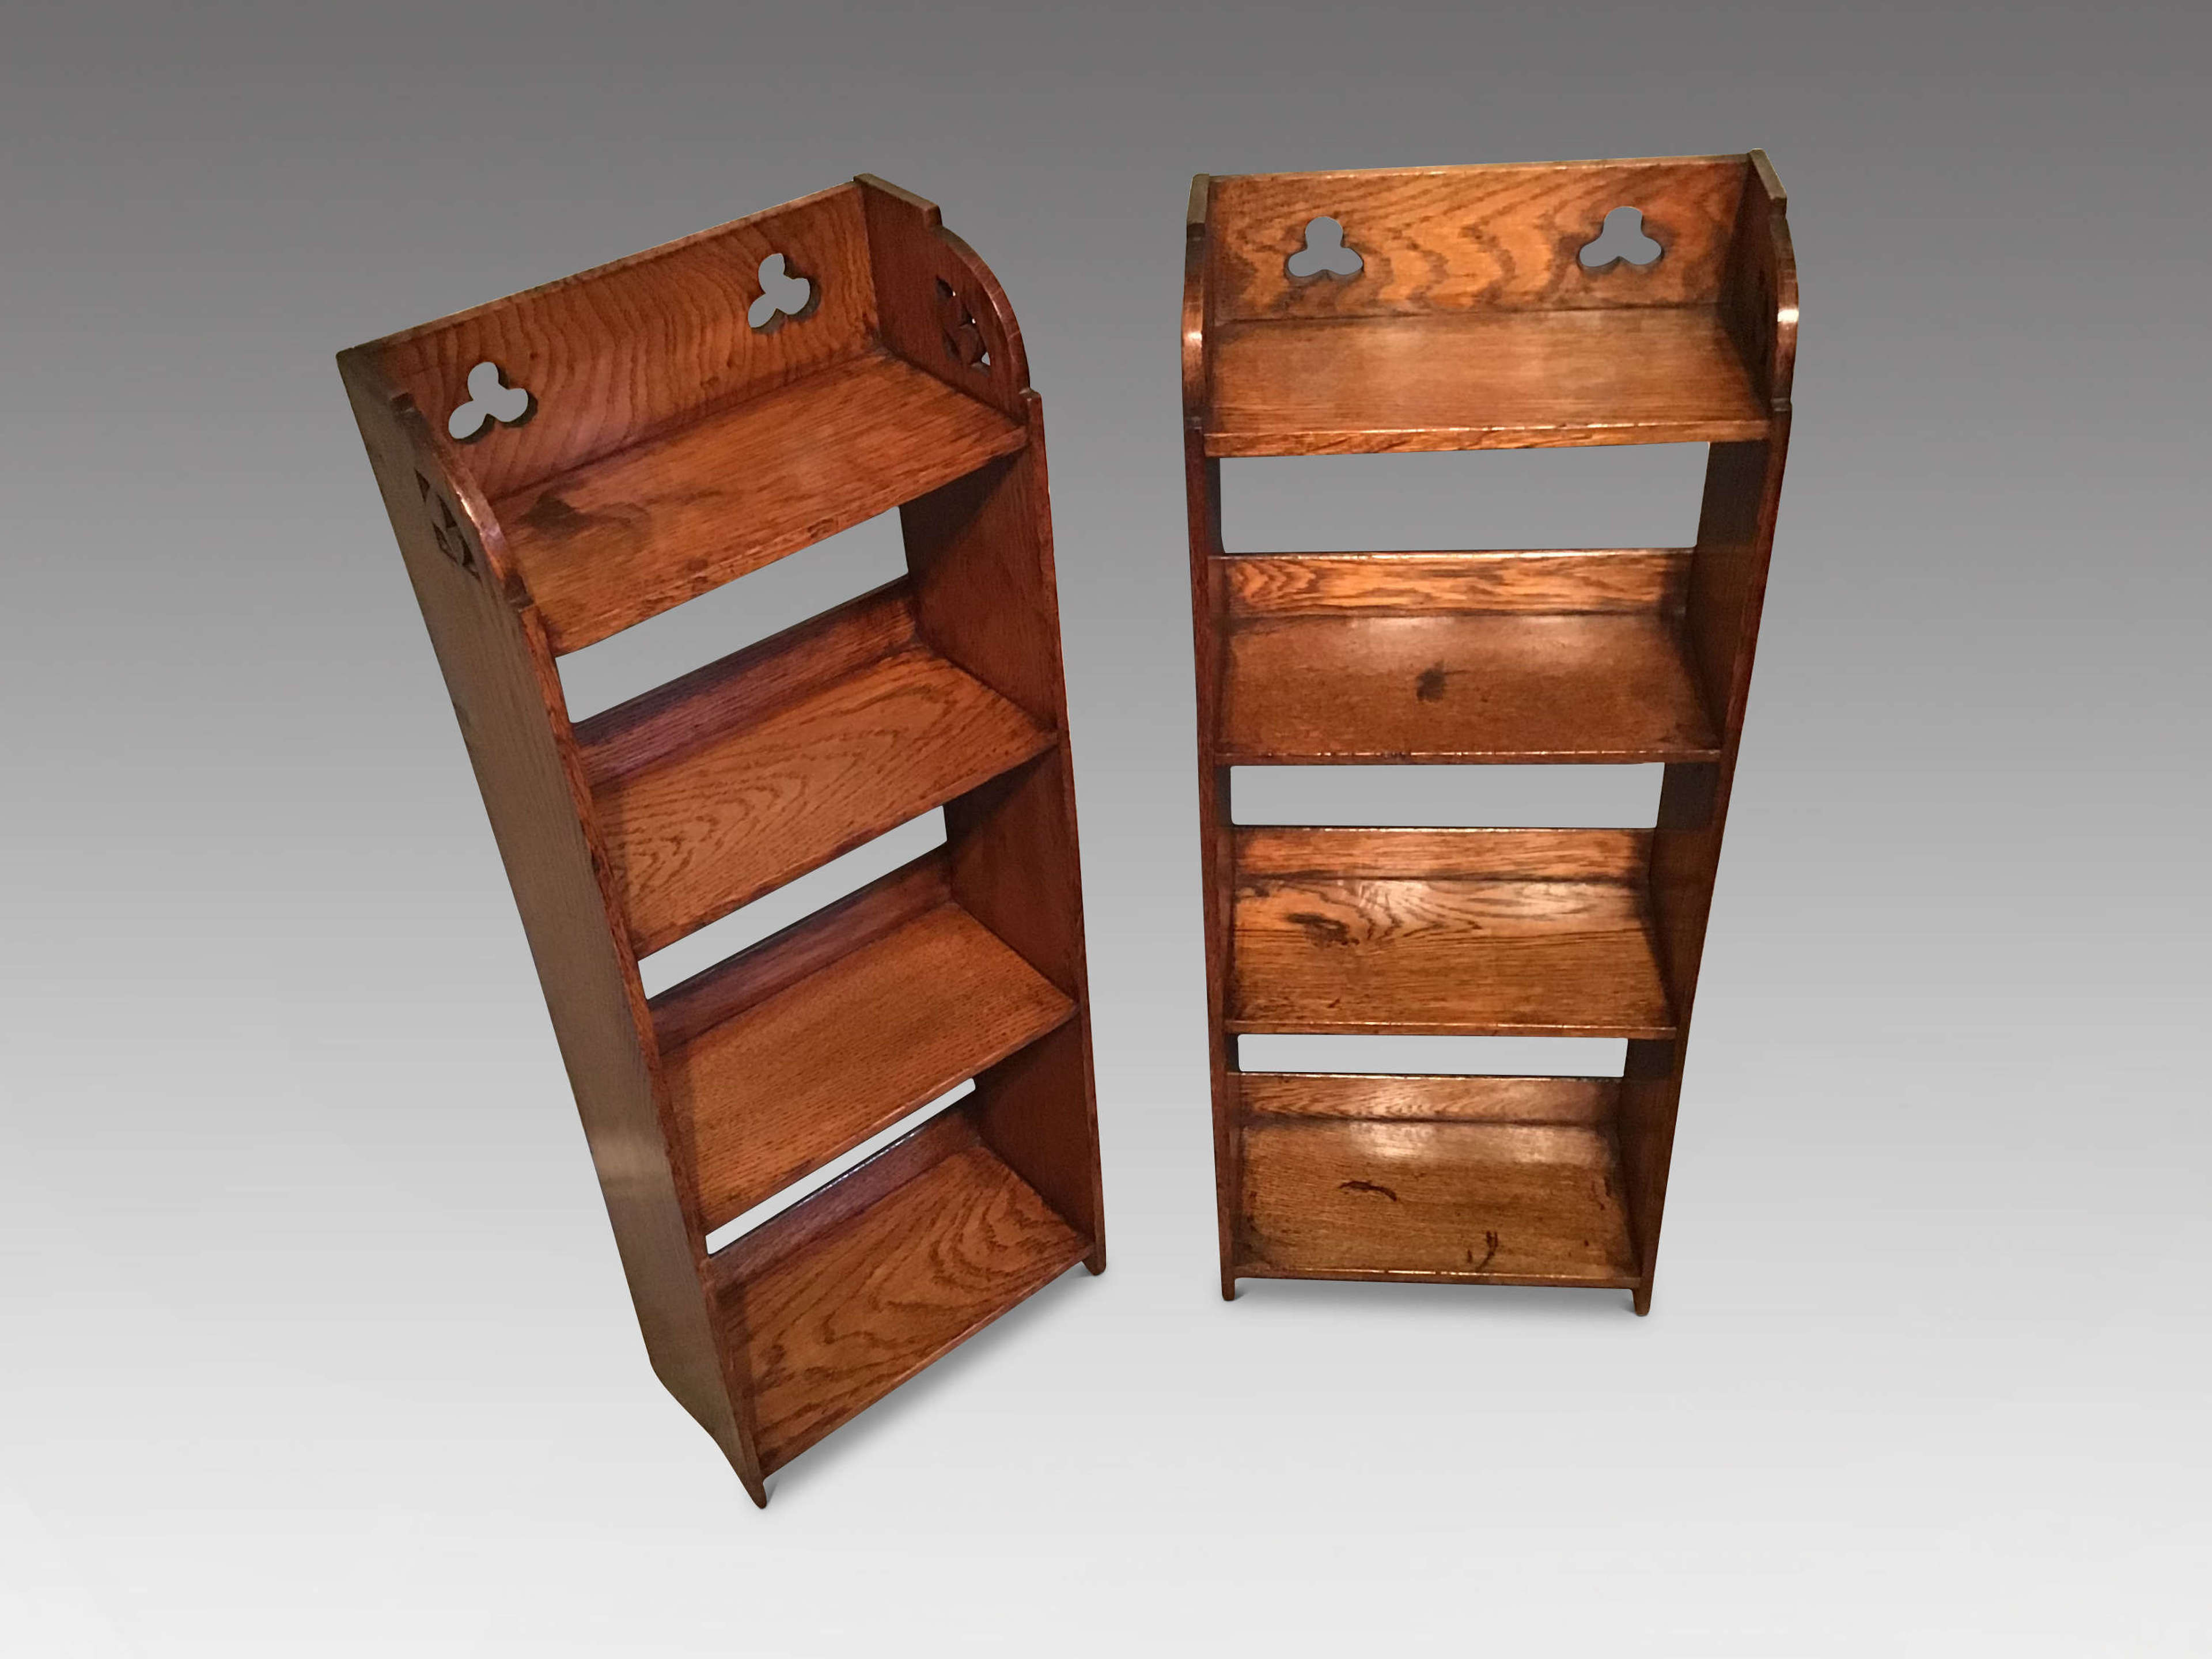 Arts and Crafts oak bookcases